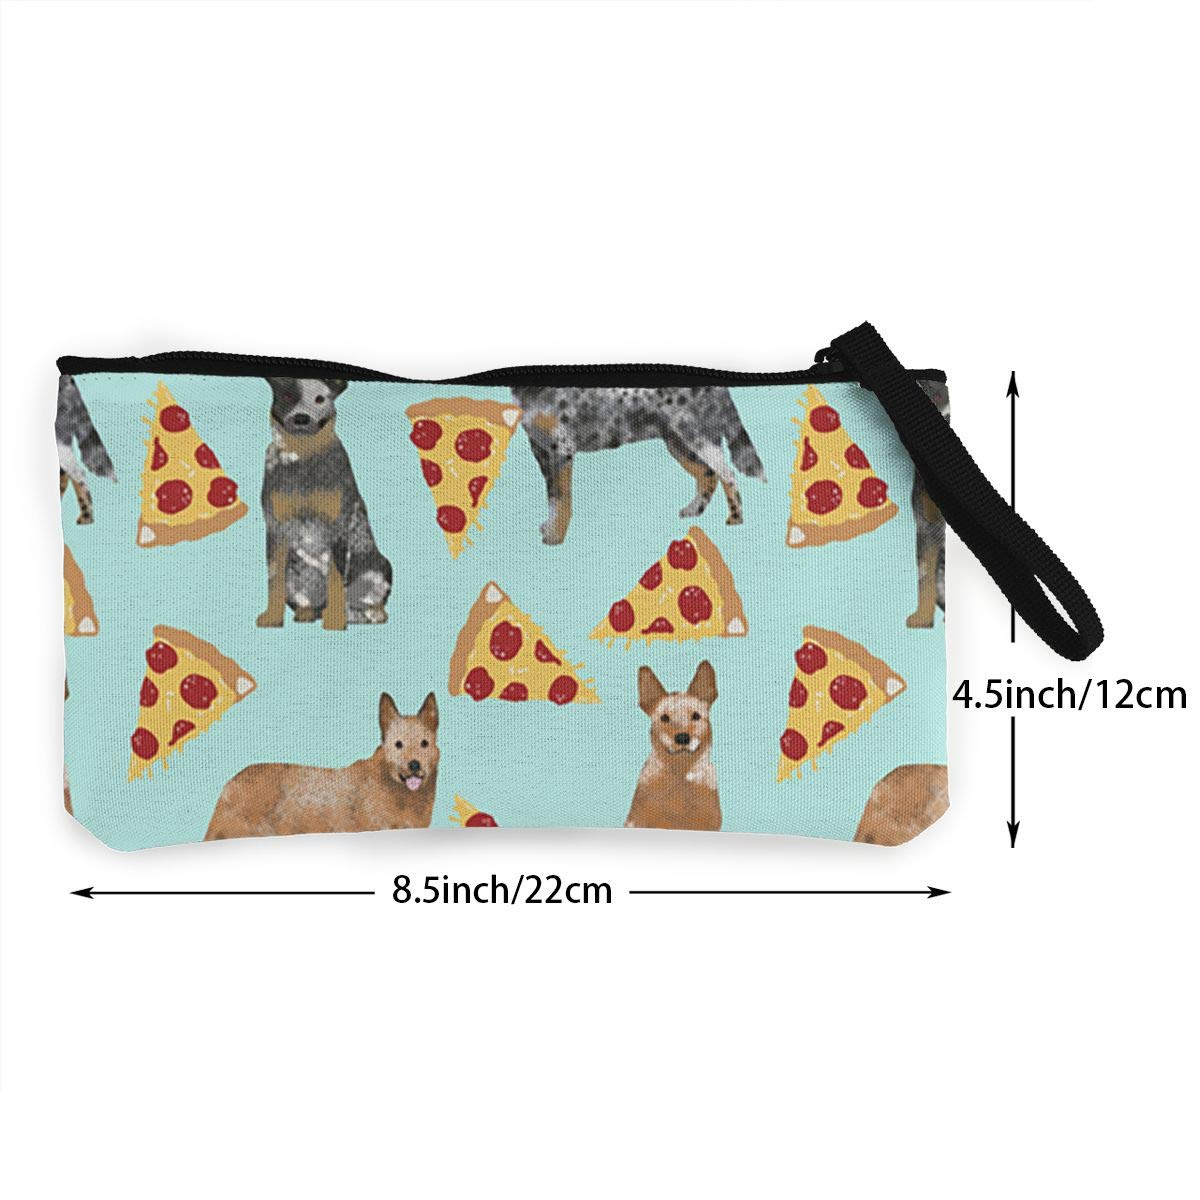 Make Up Bag Cellphone Bag With Handle DH14hjsdDEE Australian Cattle Dog Pizza Zipper Canvas Coin Purse Wallet